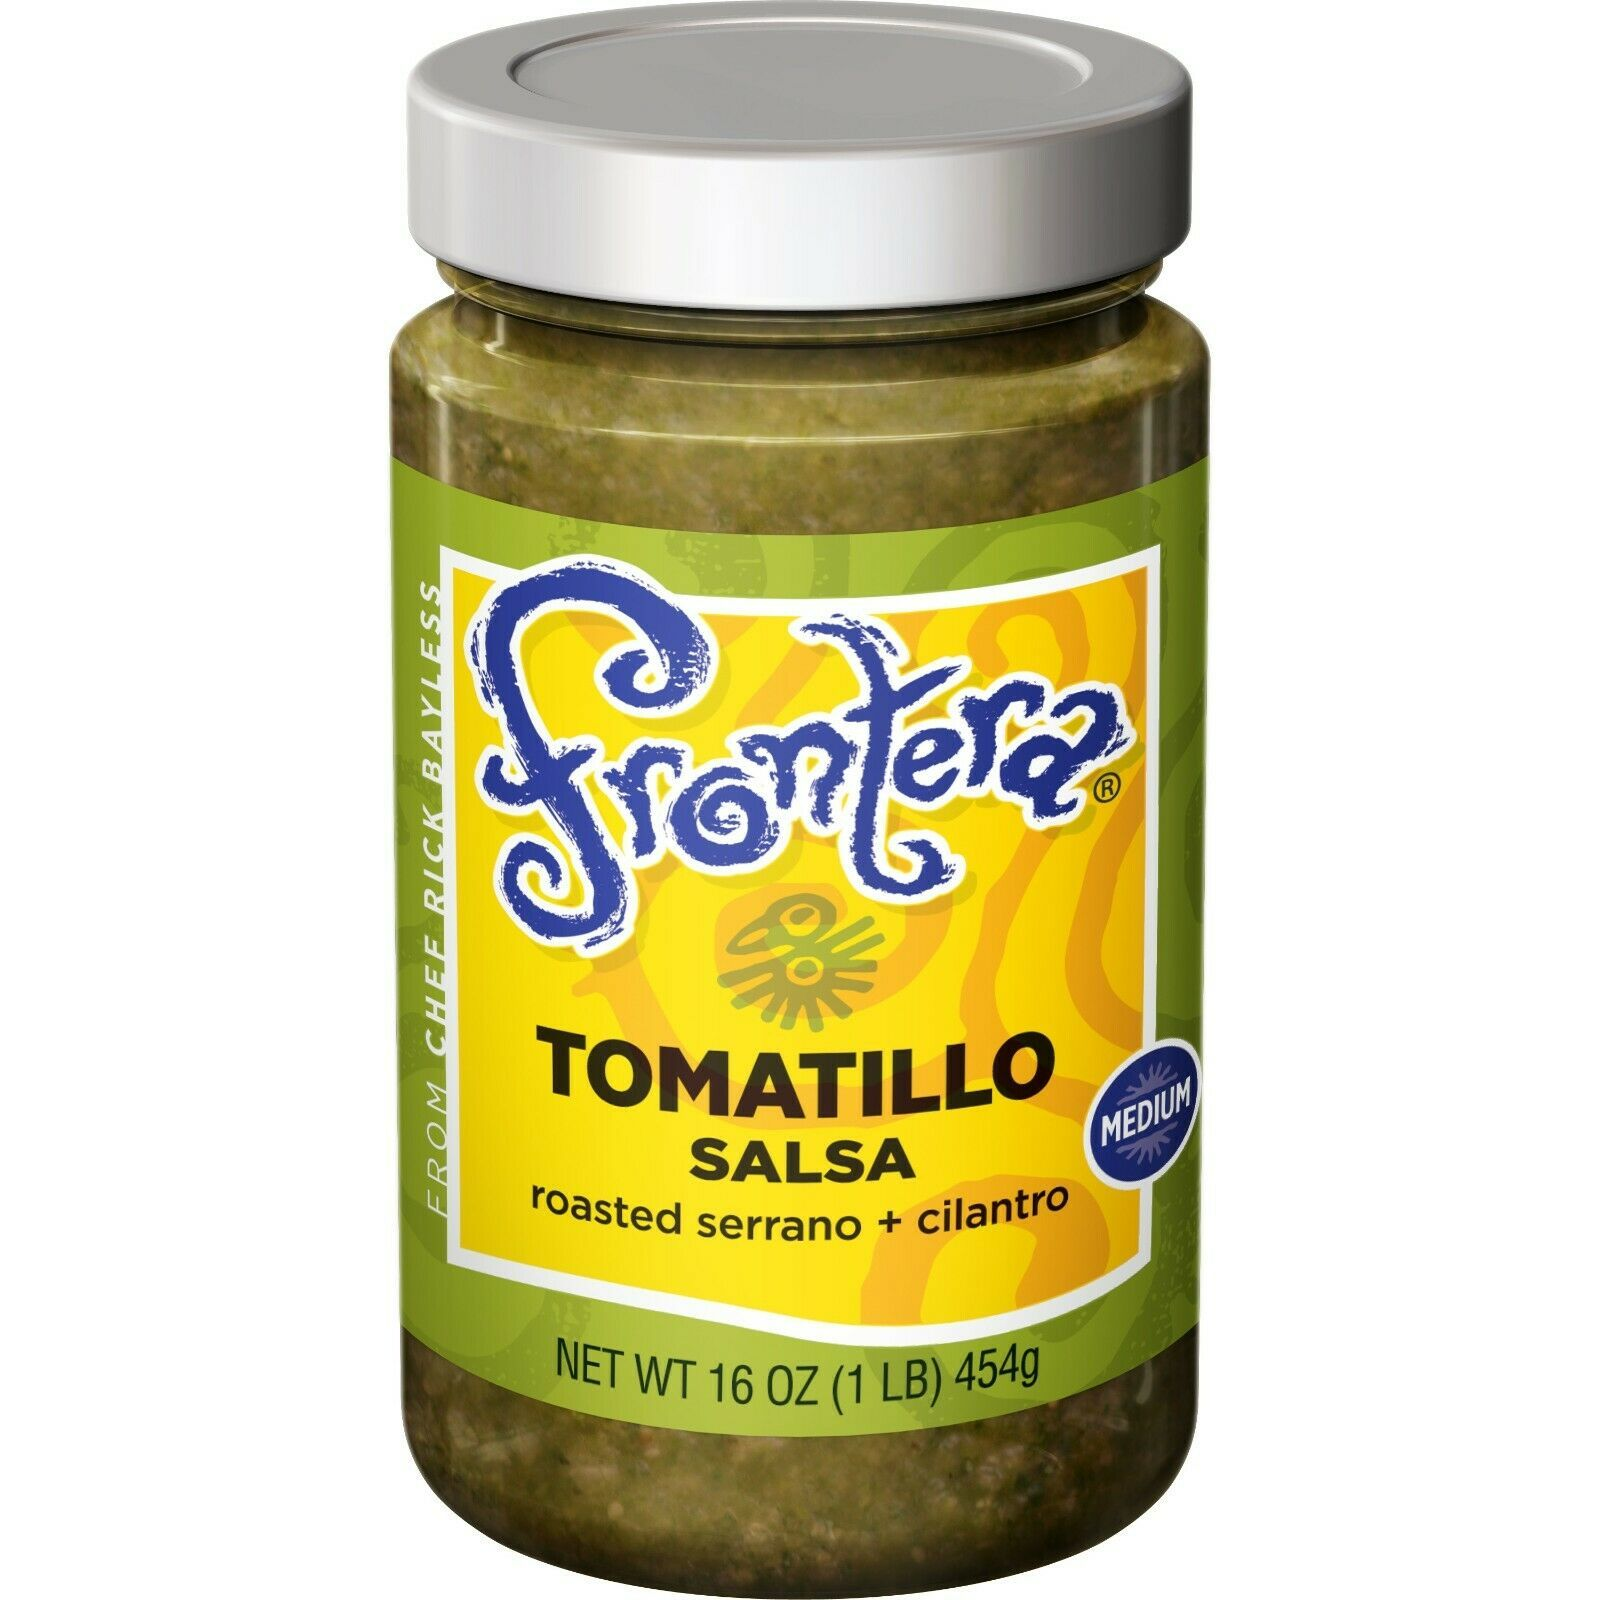 Frontera Tomatillo Salsa (Medium.)-  - Case Of 6 - 16 Oz Glass Jars - $25.73